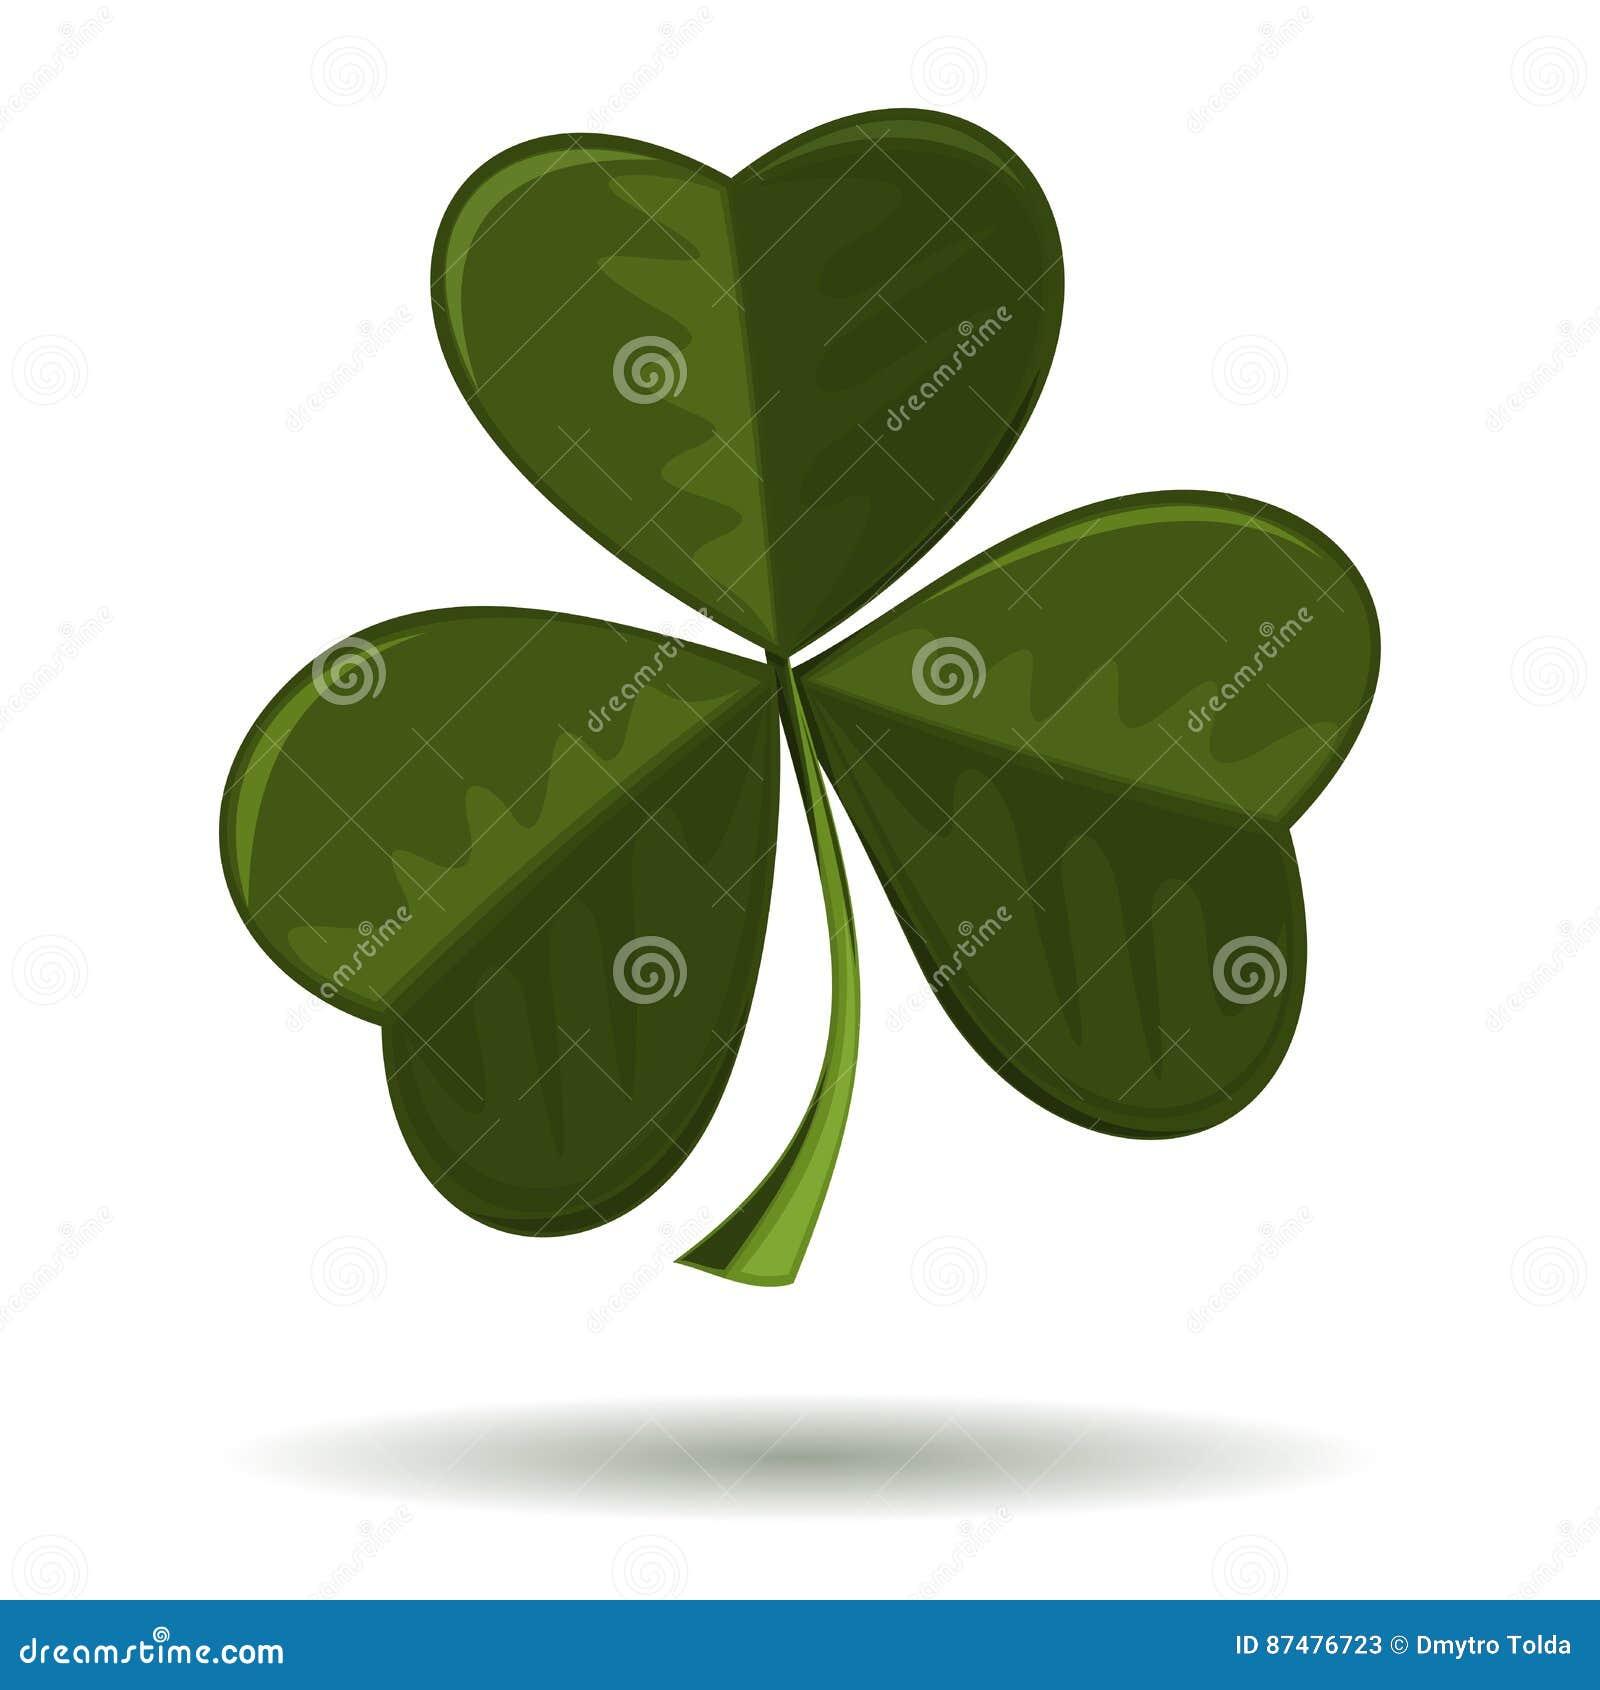 Shamrock seamrog trifoliate clover symbol of ireland and shamrock seamrog trifoliate clover symbol of ireland and celebration of st patricks day biocorpaavc Gallery